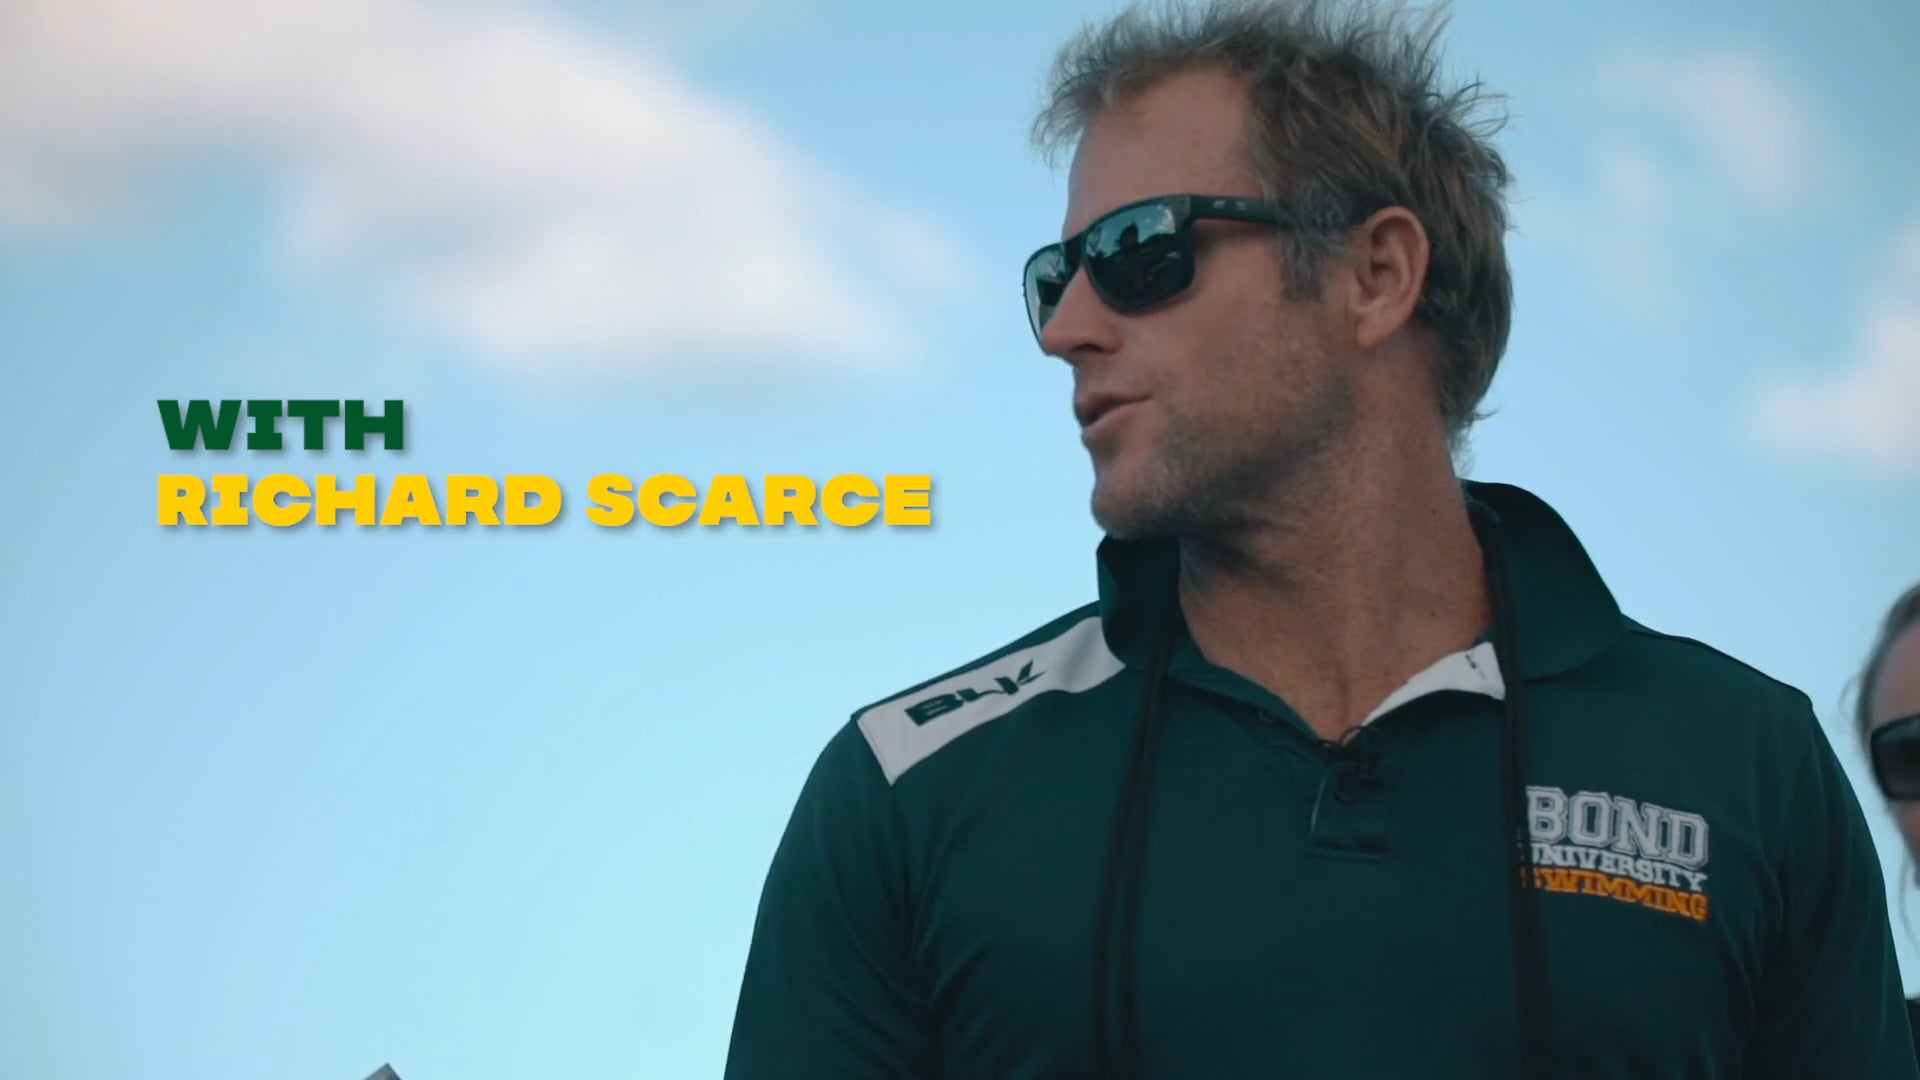 Coach & Athlete - The Bond